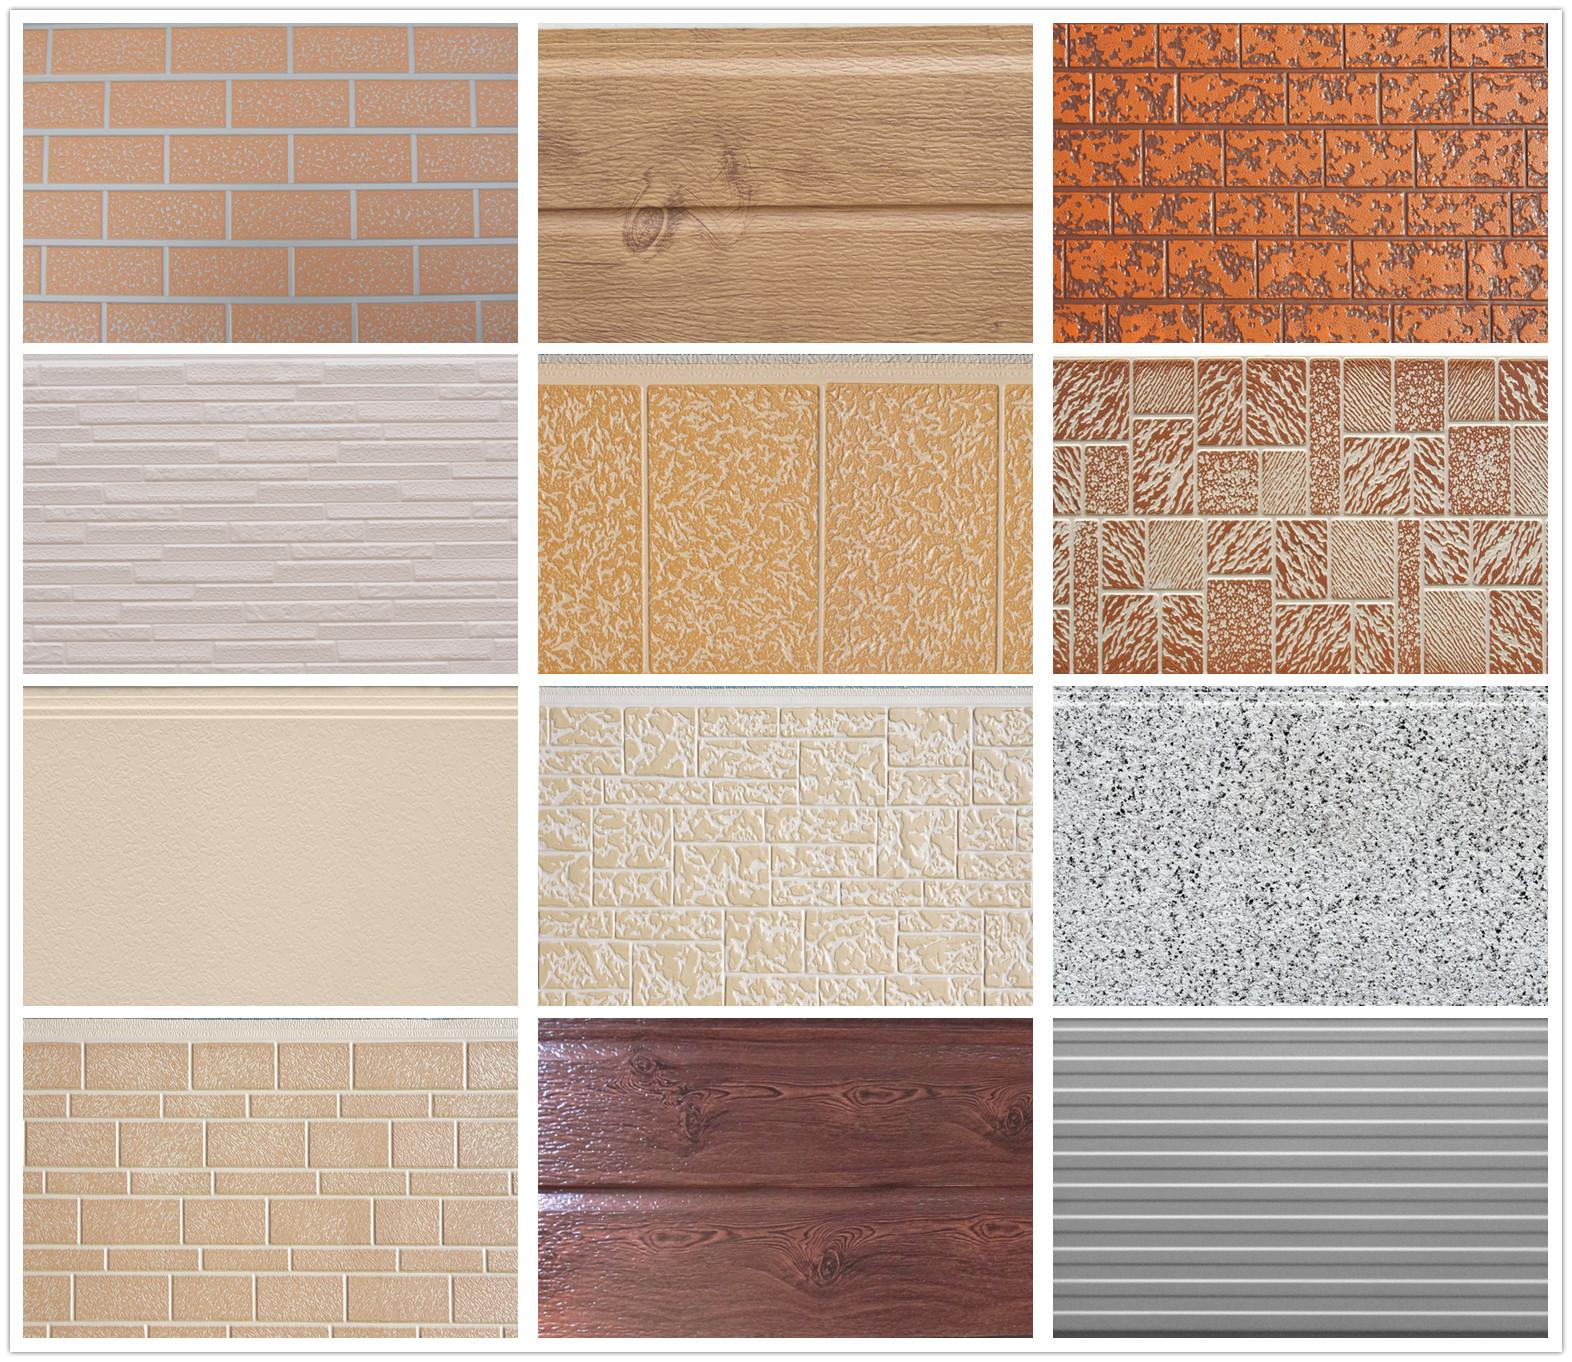 Decorative Metal Embossed Polyurethane Sandwich Wall Panel